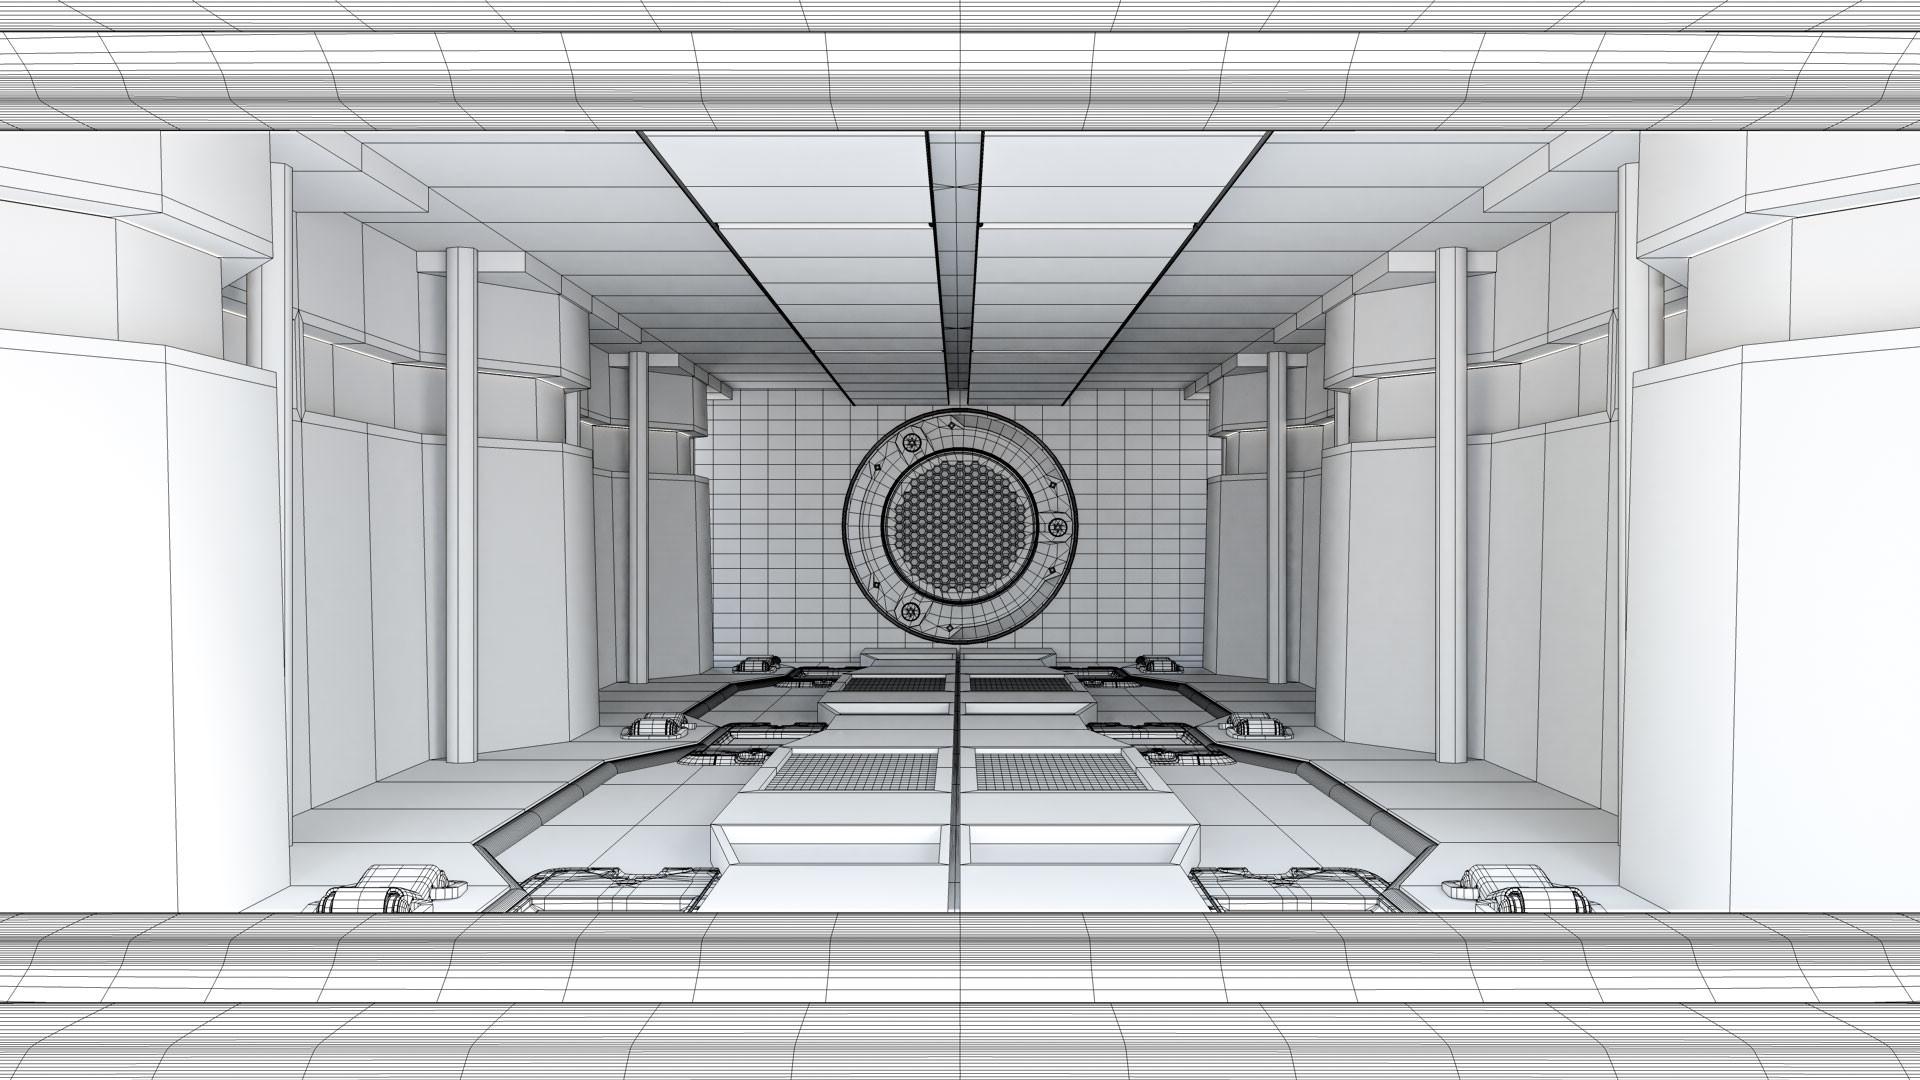 Michelangelo girardi corridor new wireframe